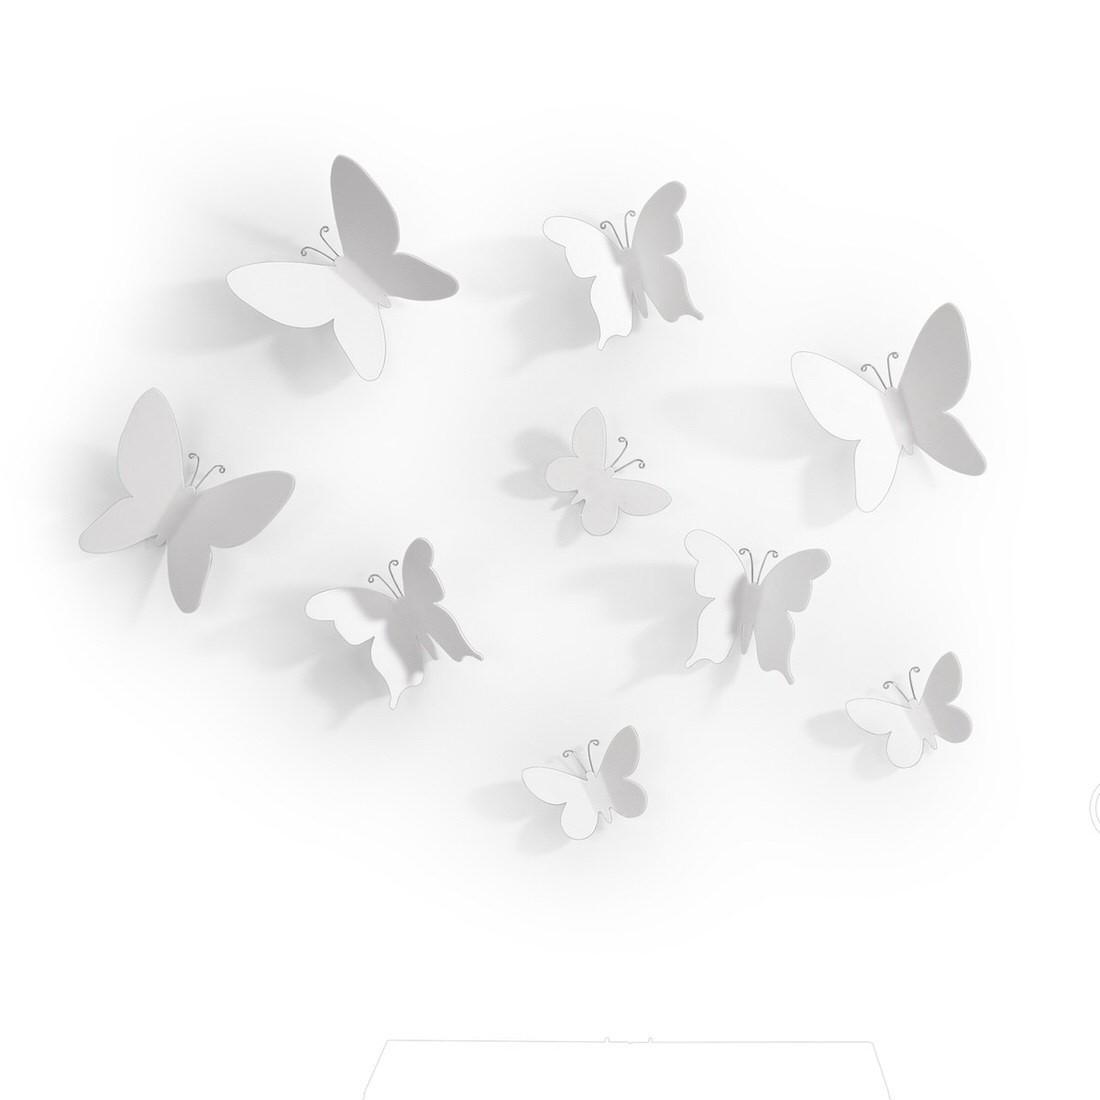 Umbra Mariposa Wall Decor Set of 9 White